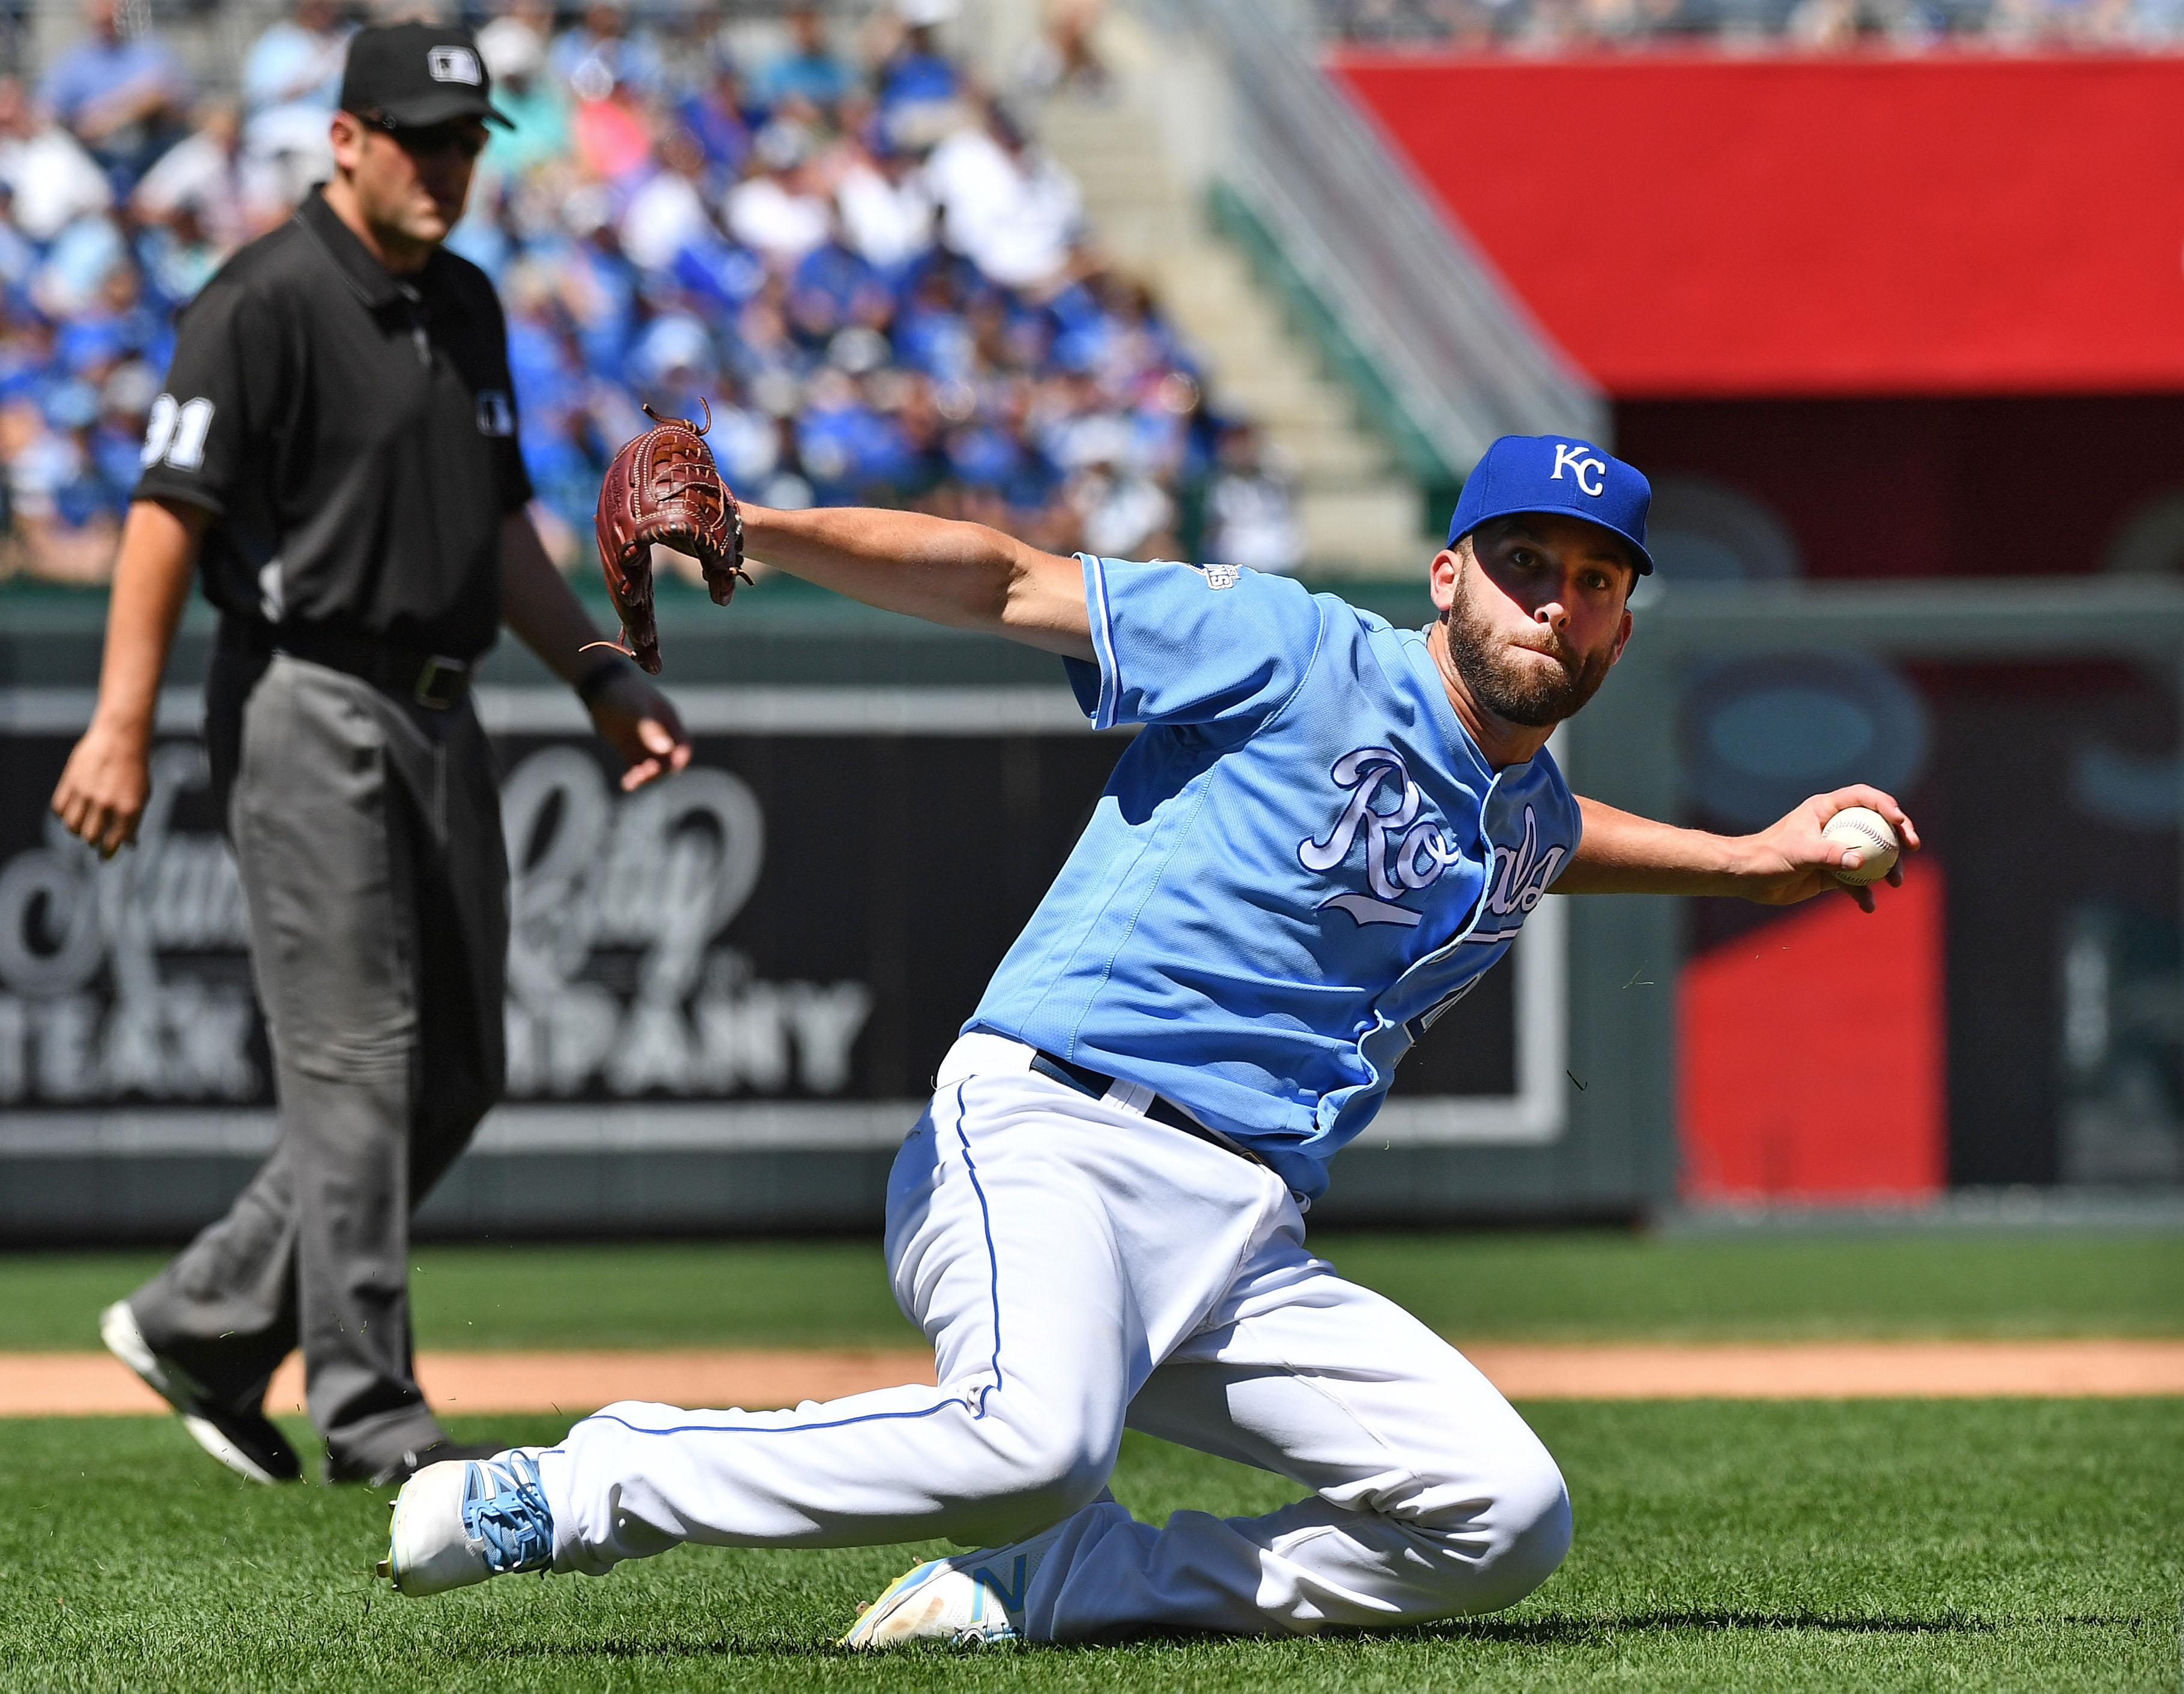 MLB: Minnesota Twins at Kansas City Royals